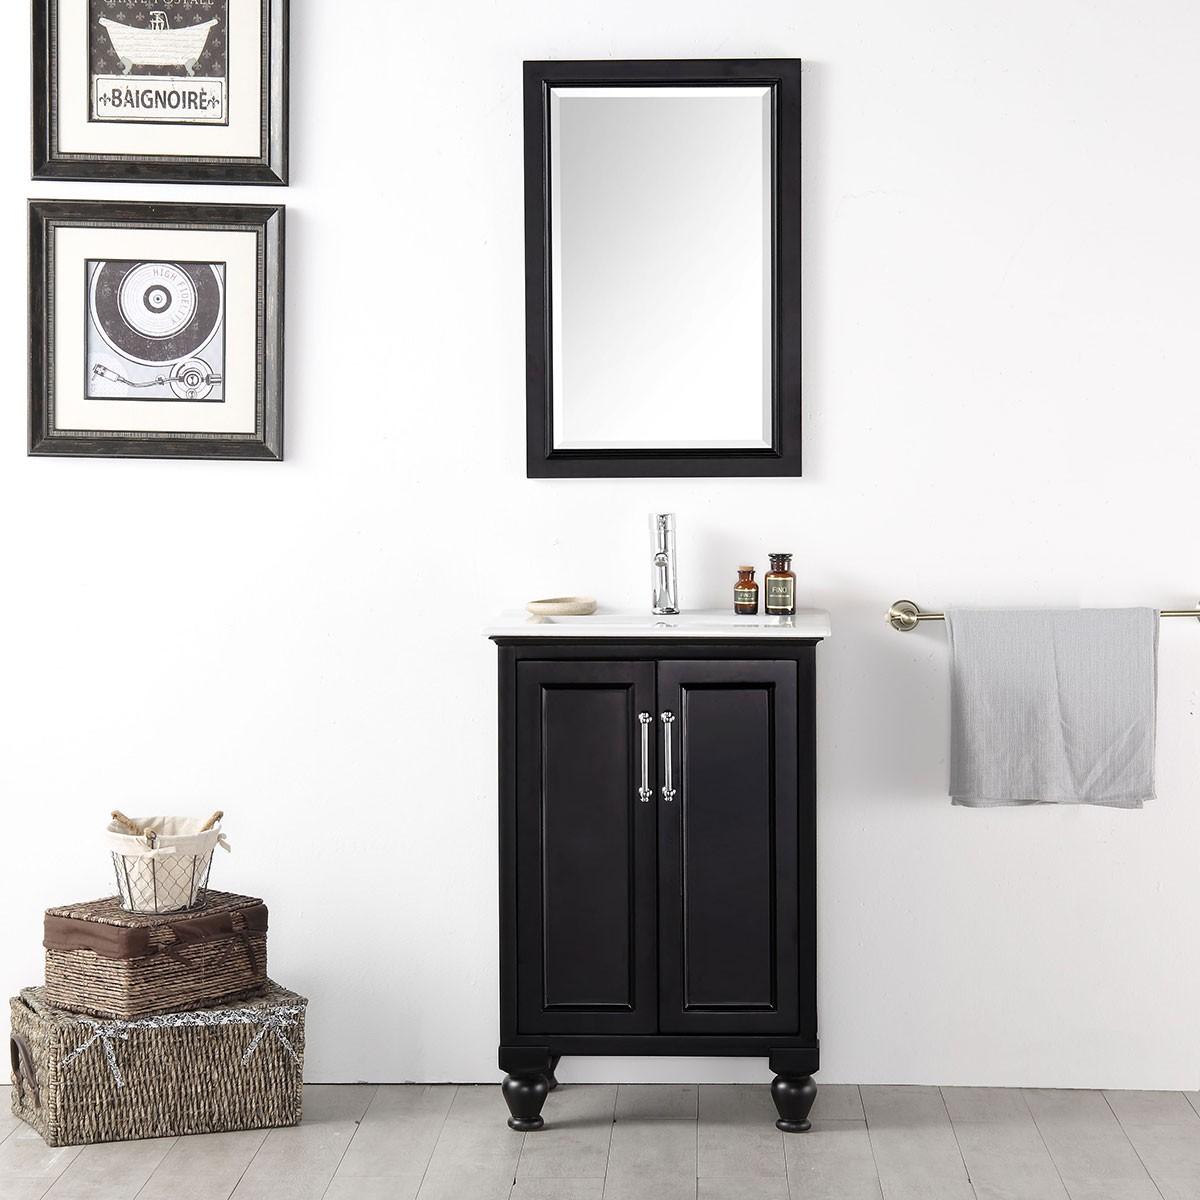 24 In Freestanding Bathroom Vanity Set Without Mirror Dk 6524 E Decoraport Usa